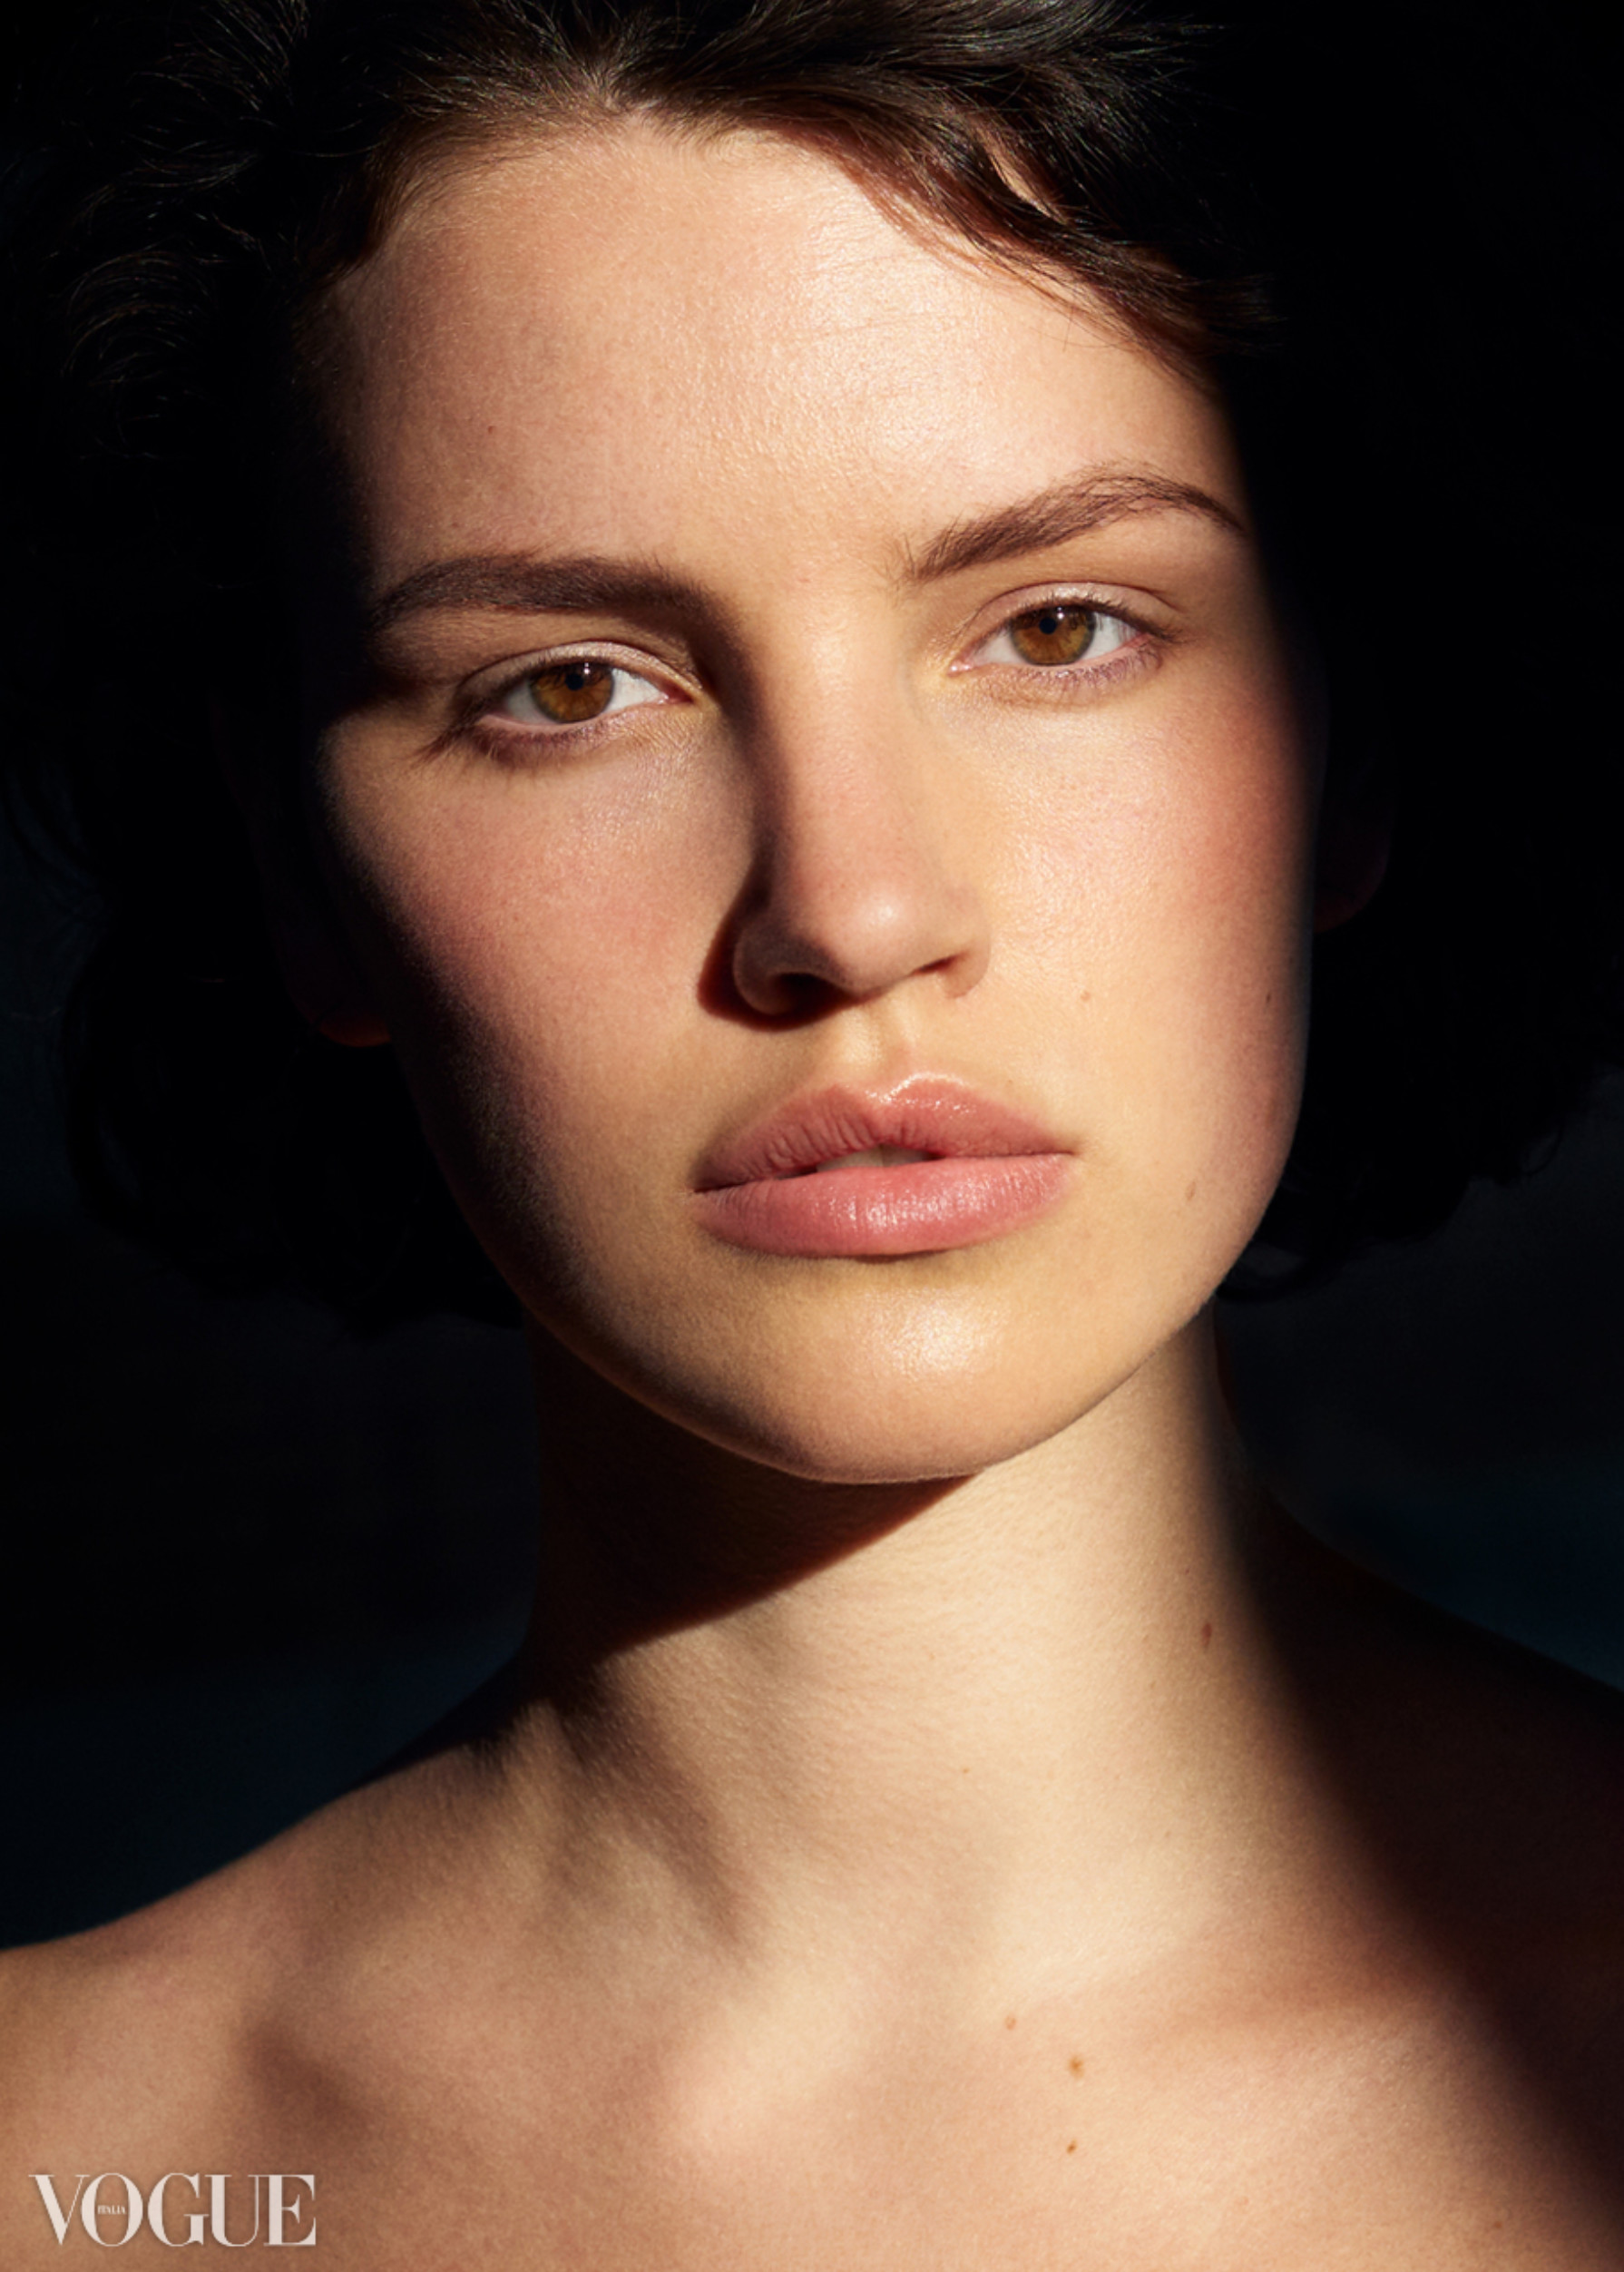 BRIDGE Model's Lina Florine shoots for Vogue Italia